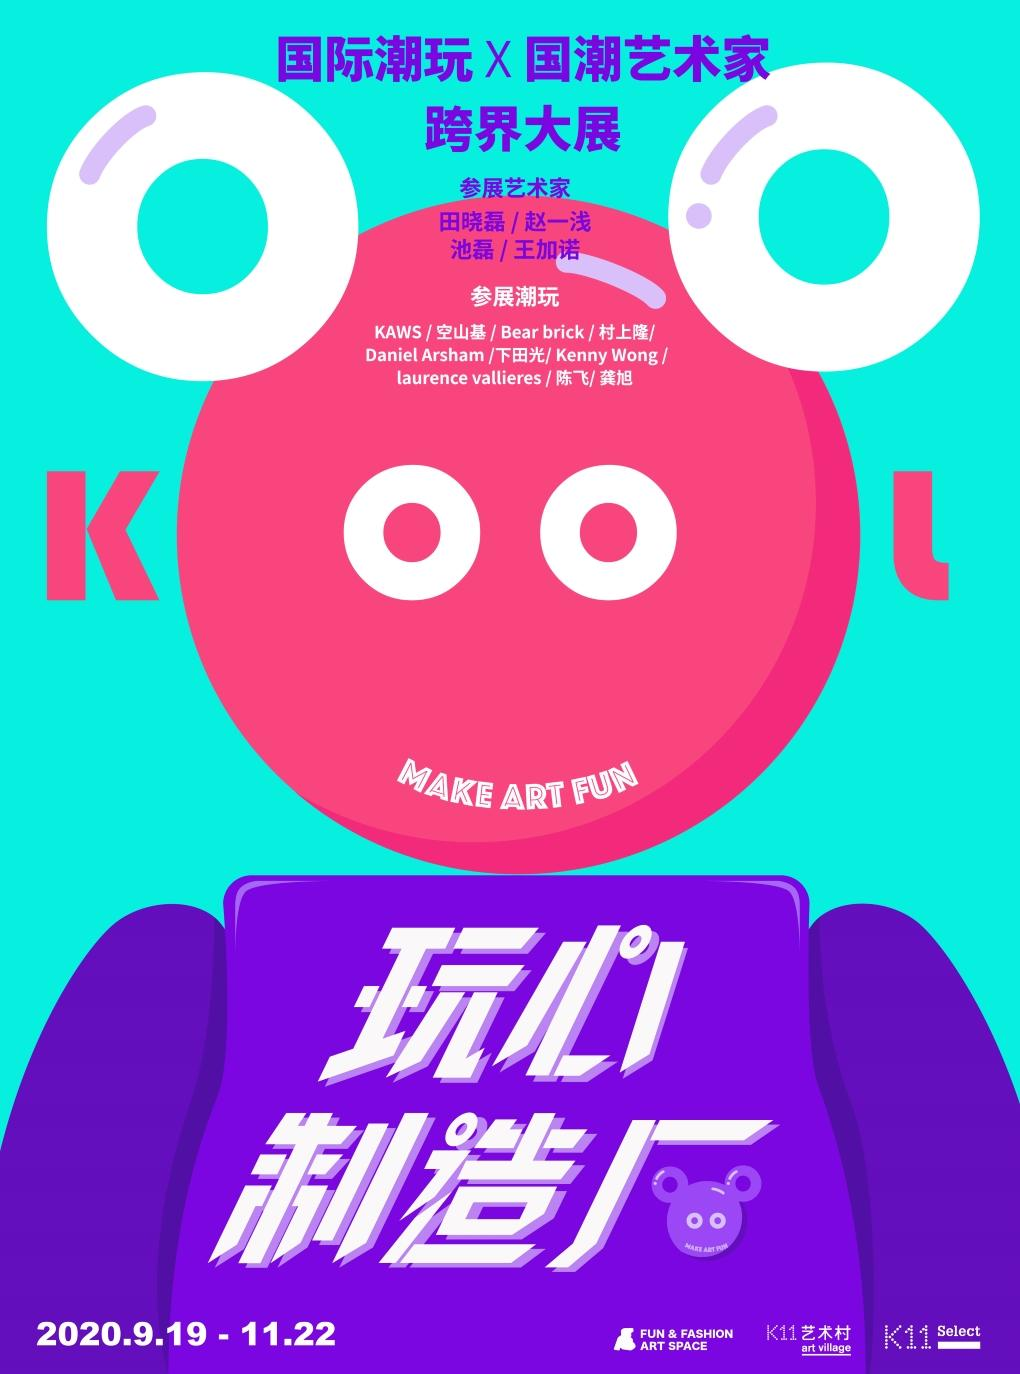 KOOOOL玩心制造厂 潮流艺术大展来袭